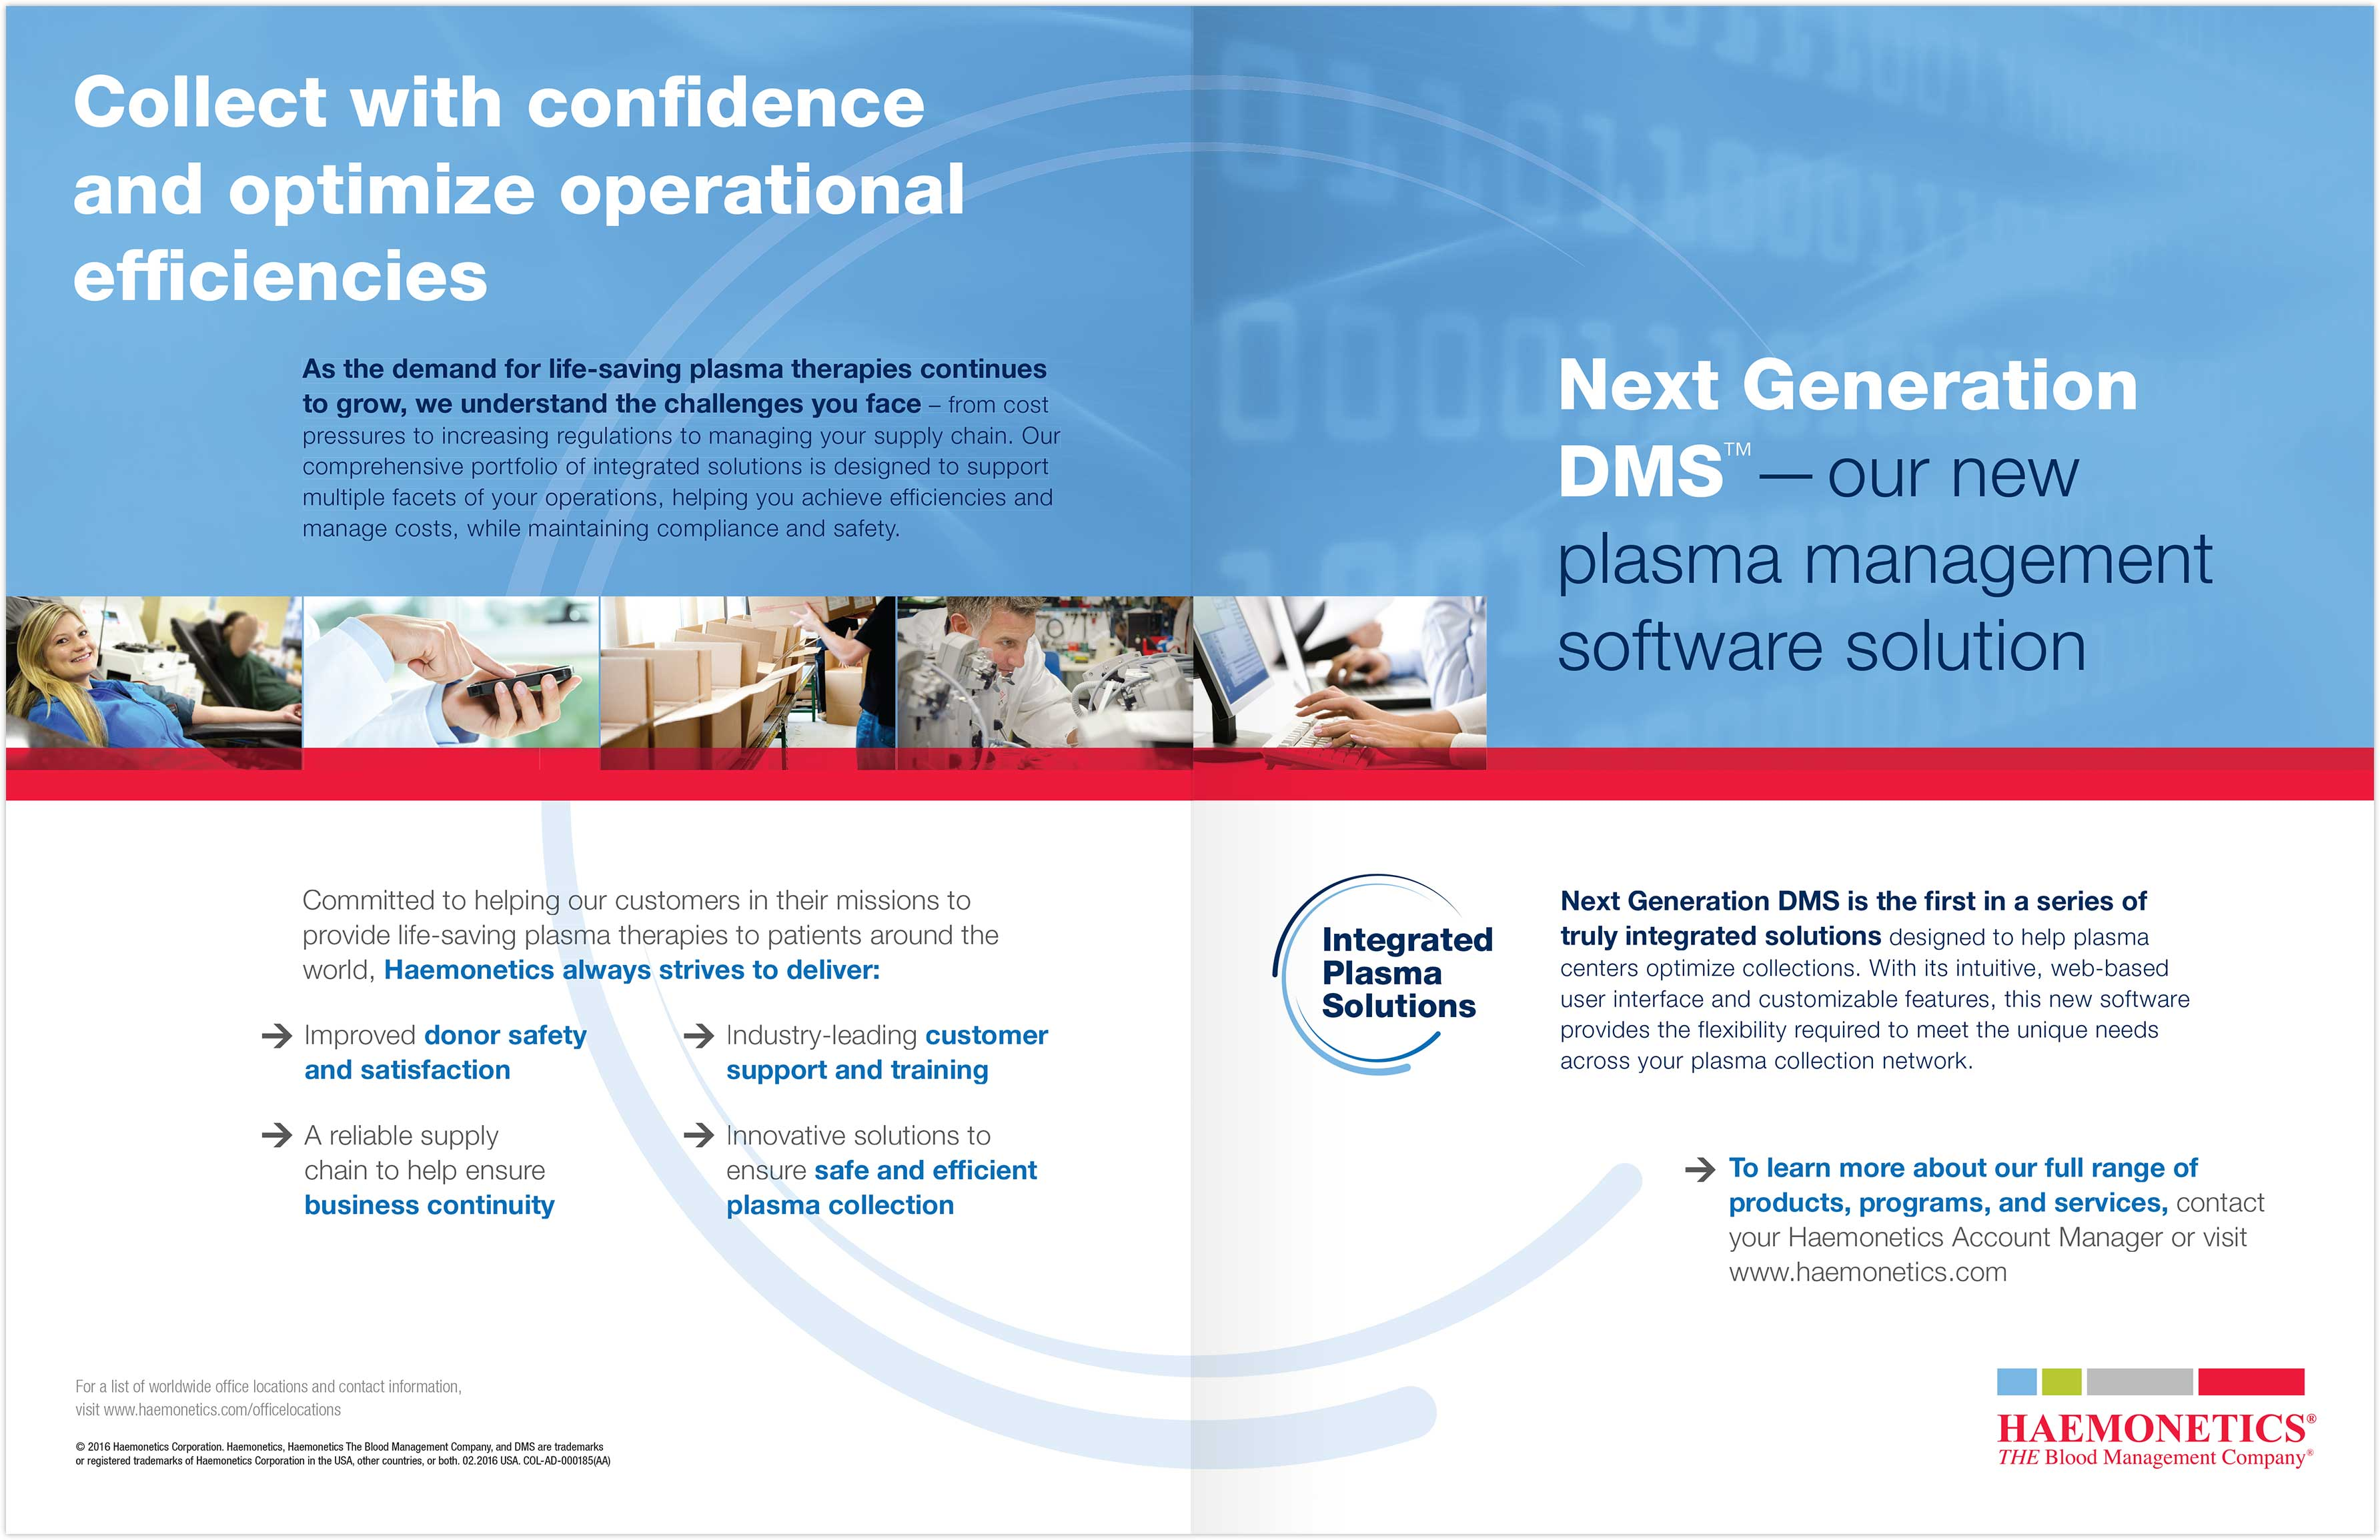 Integrated Plasma Solutions spread